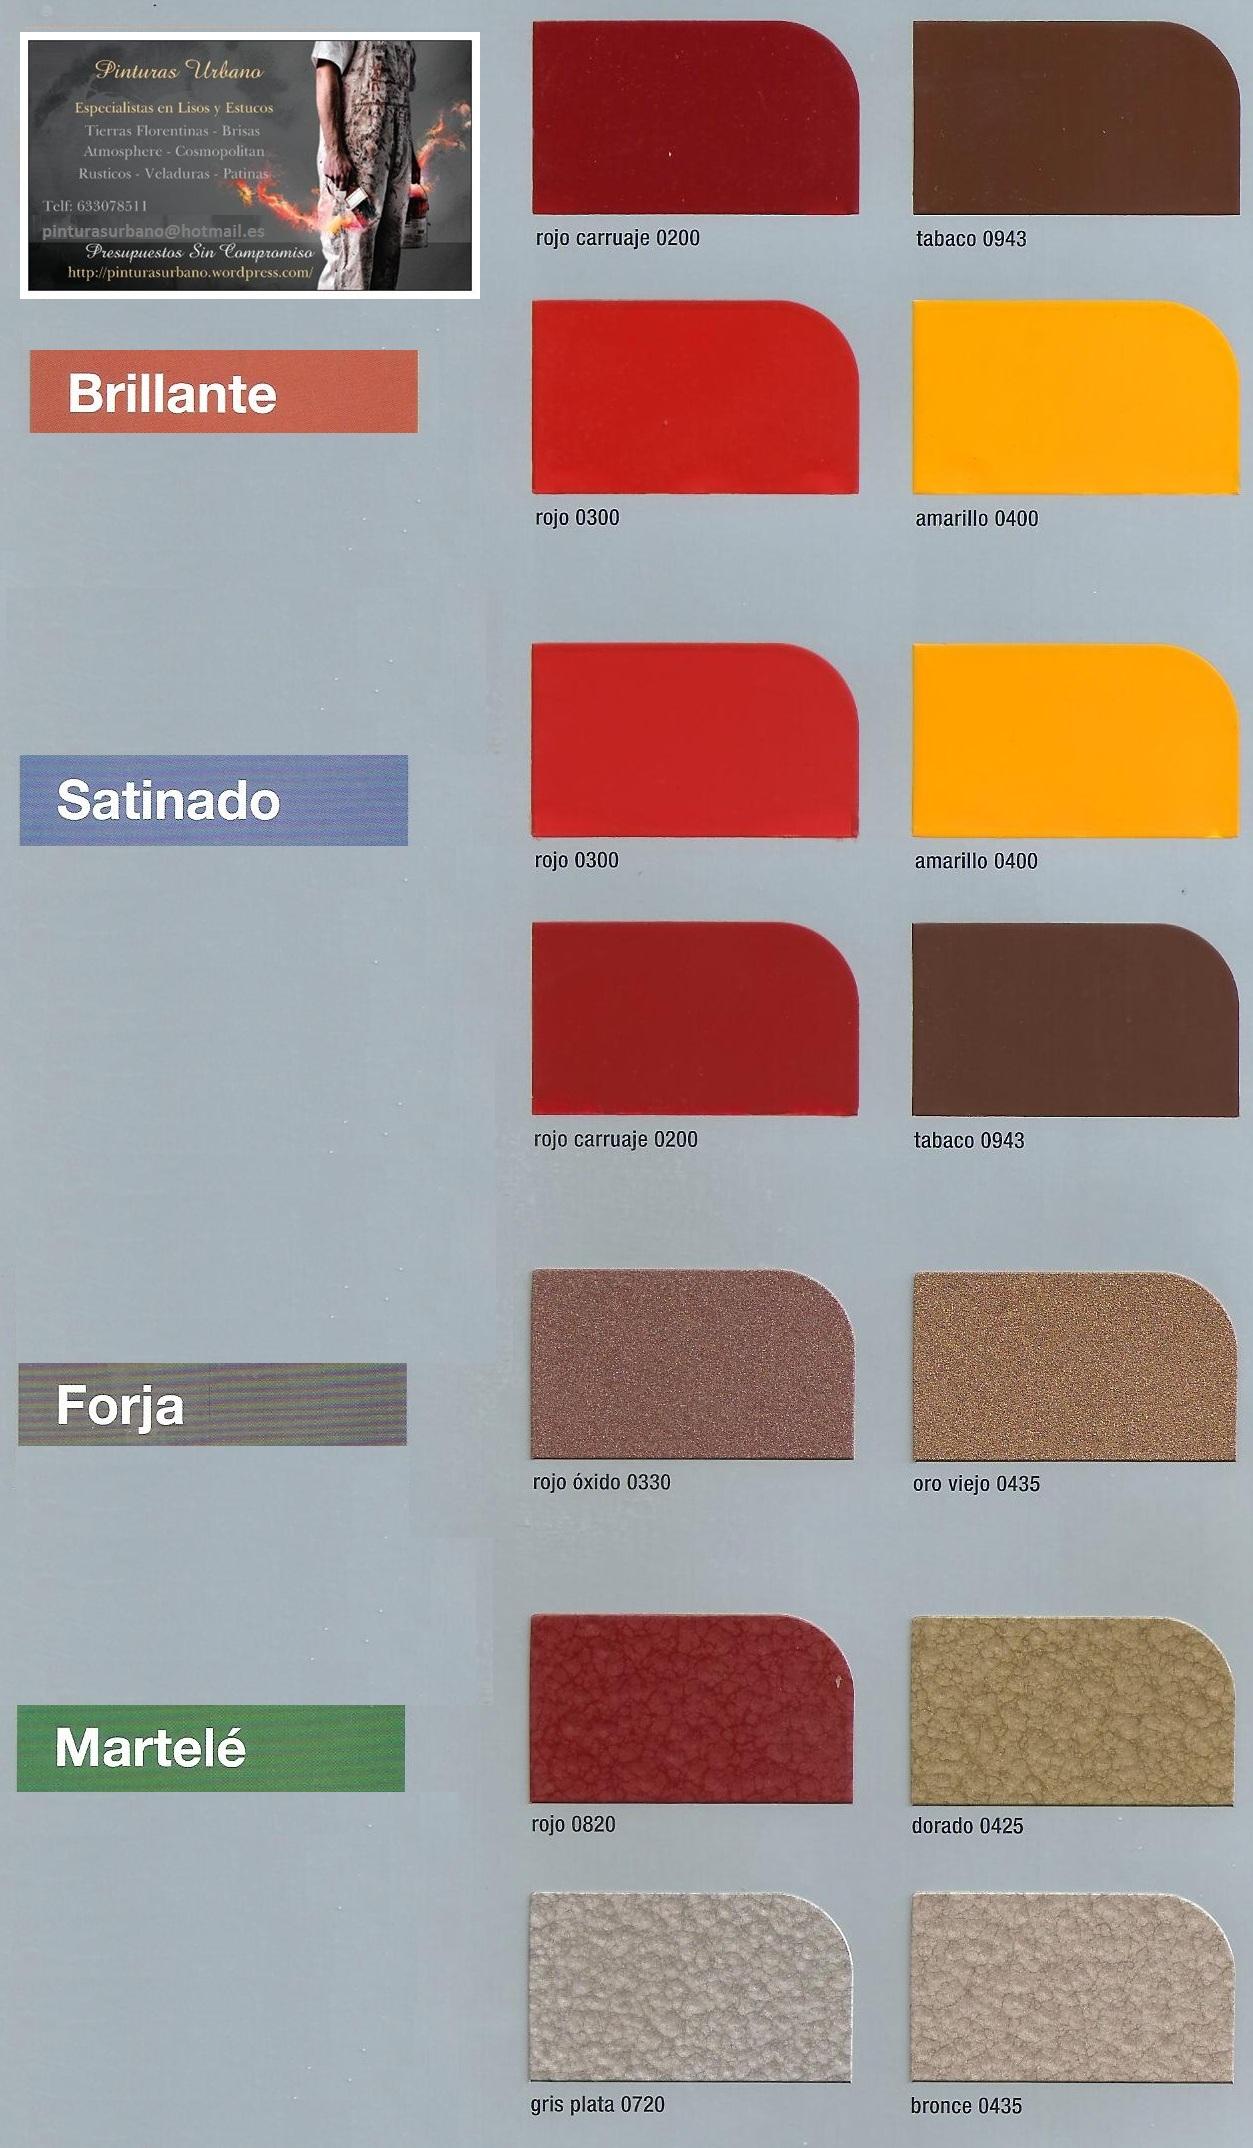 Catalogo de pinturas bruguer cat logo de obras de arte del estilo expresionista - Catalogo pinturas bruguer ...